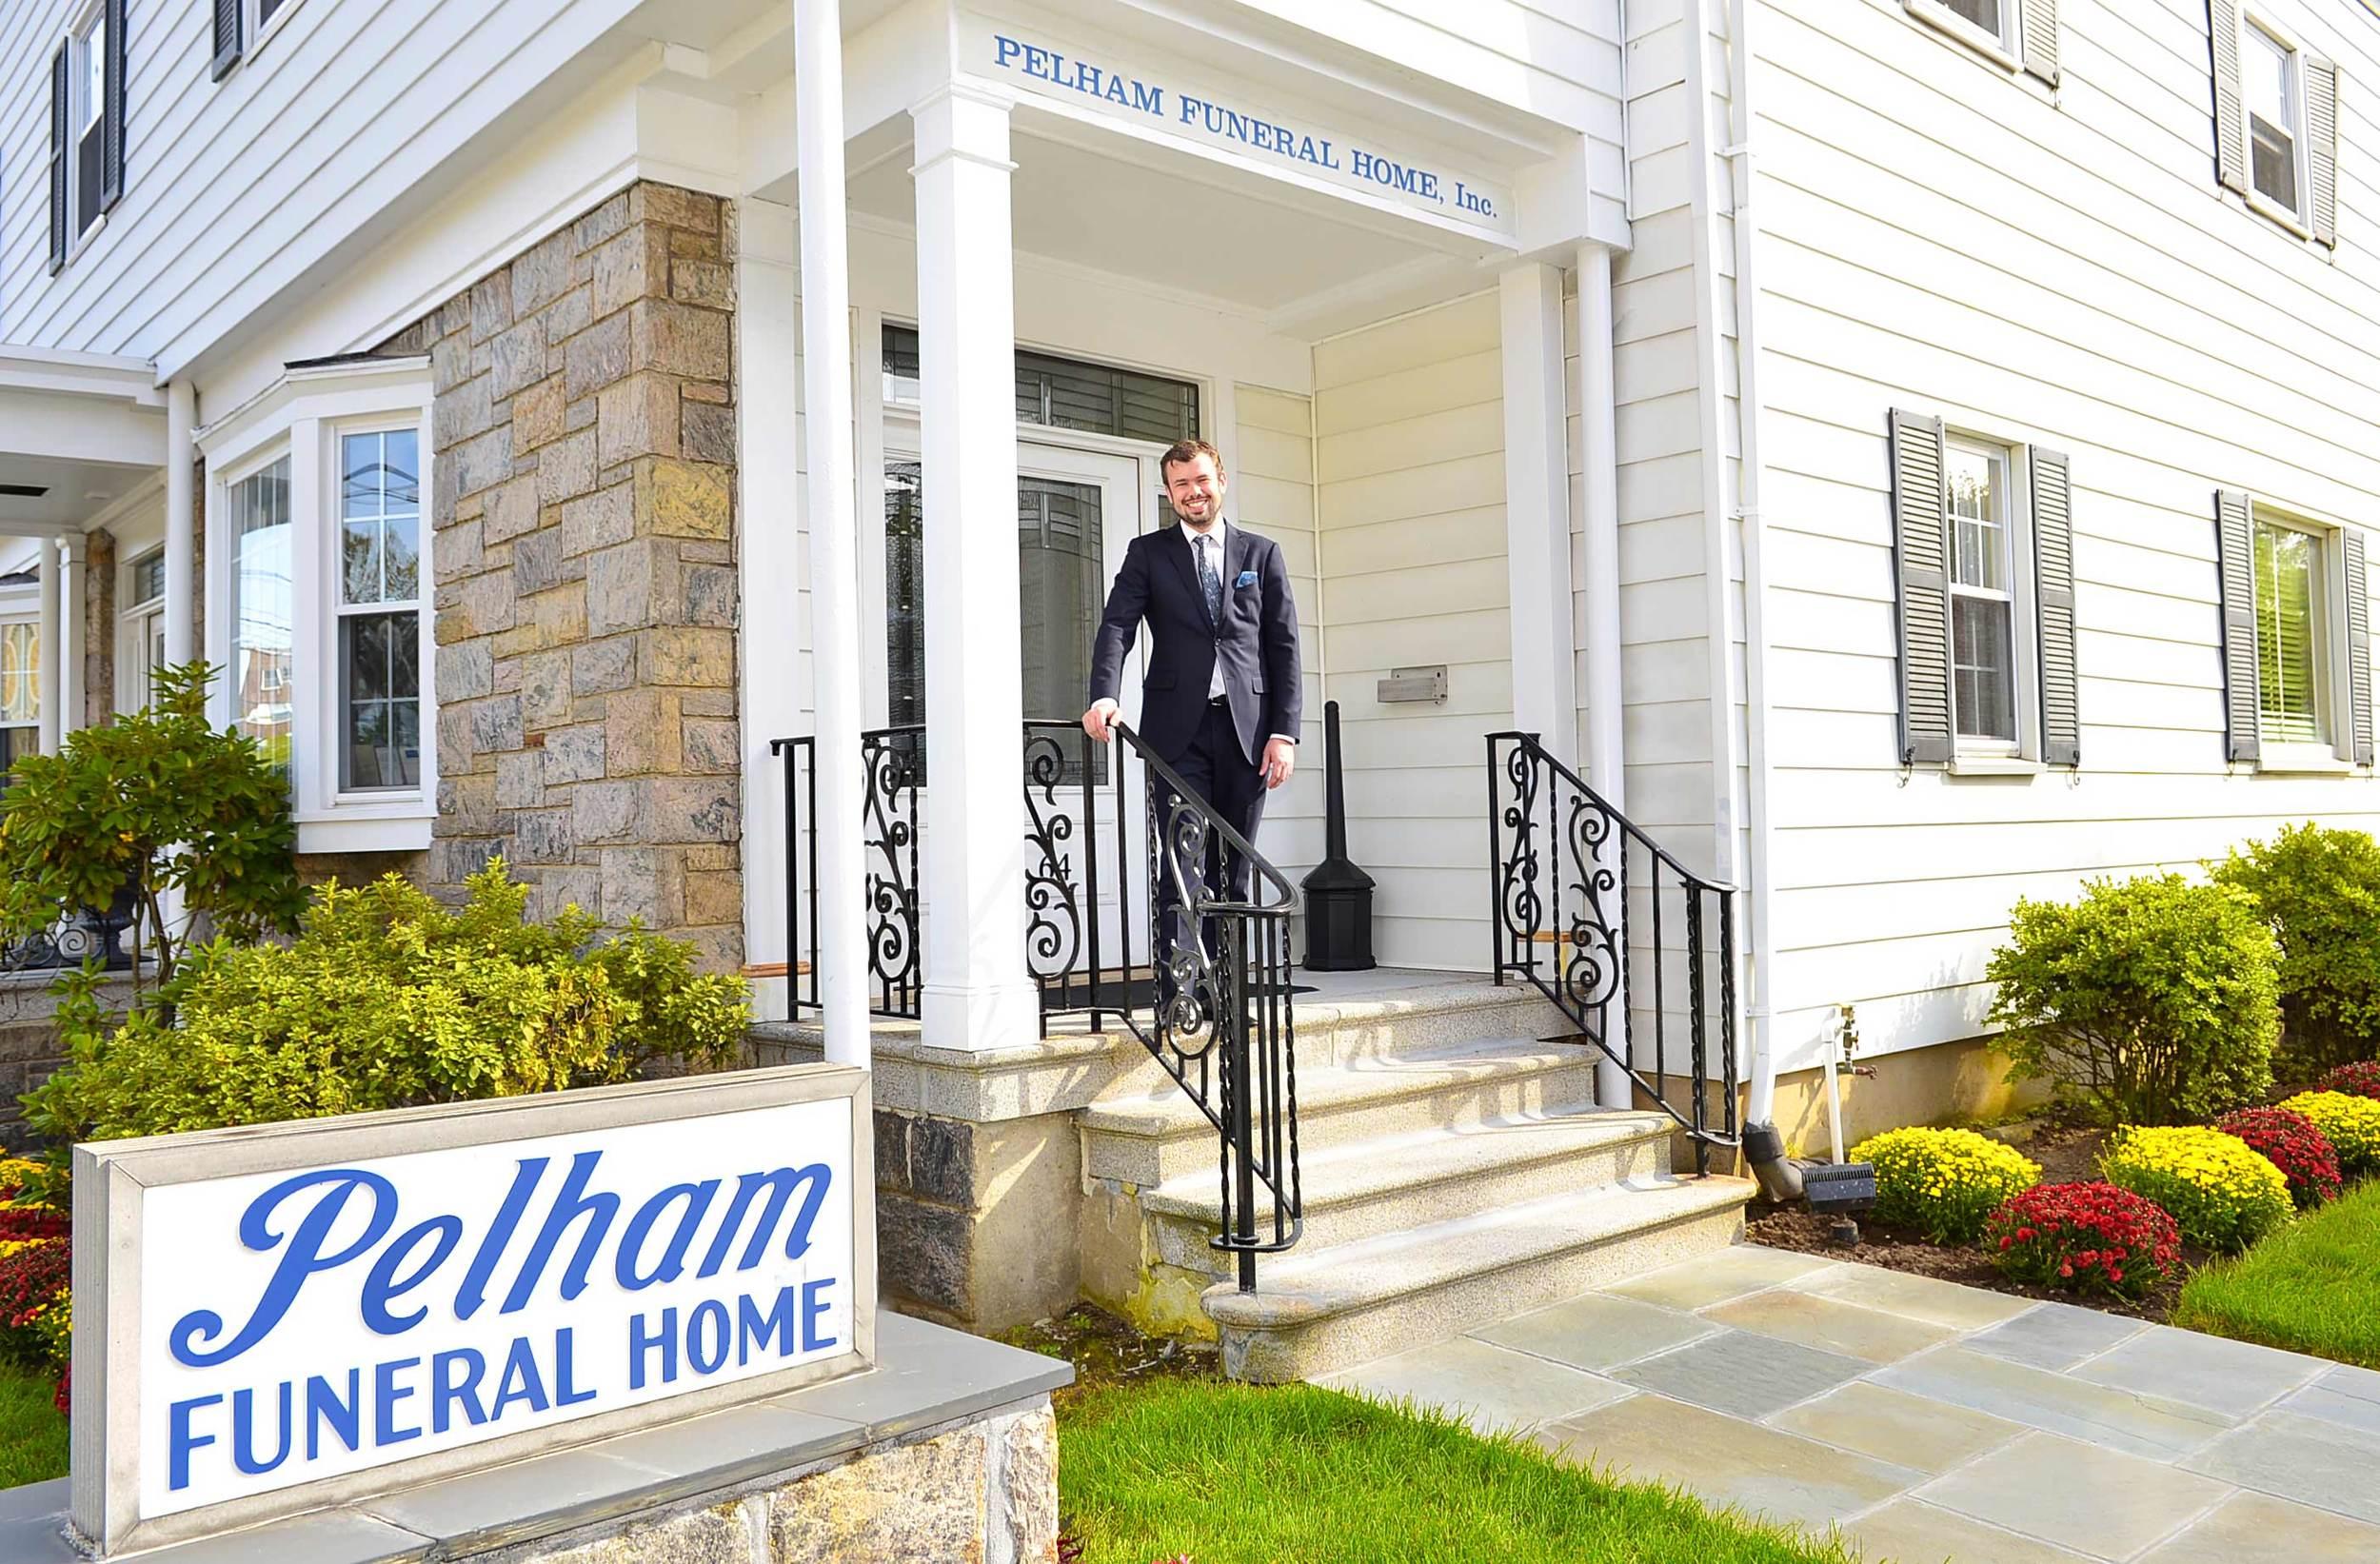 Funeral Home in Pelham, New York